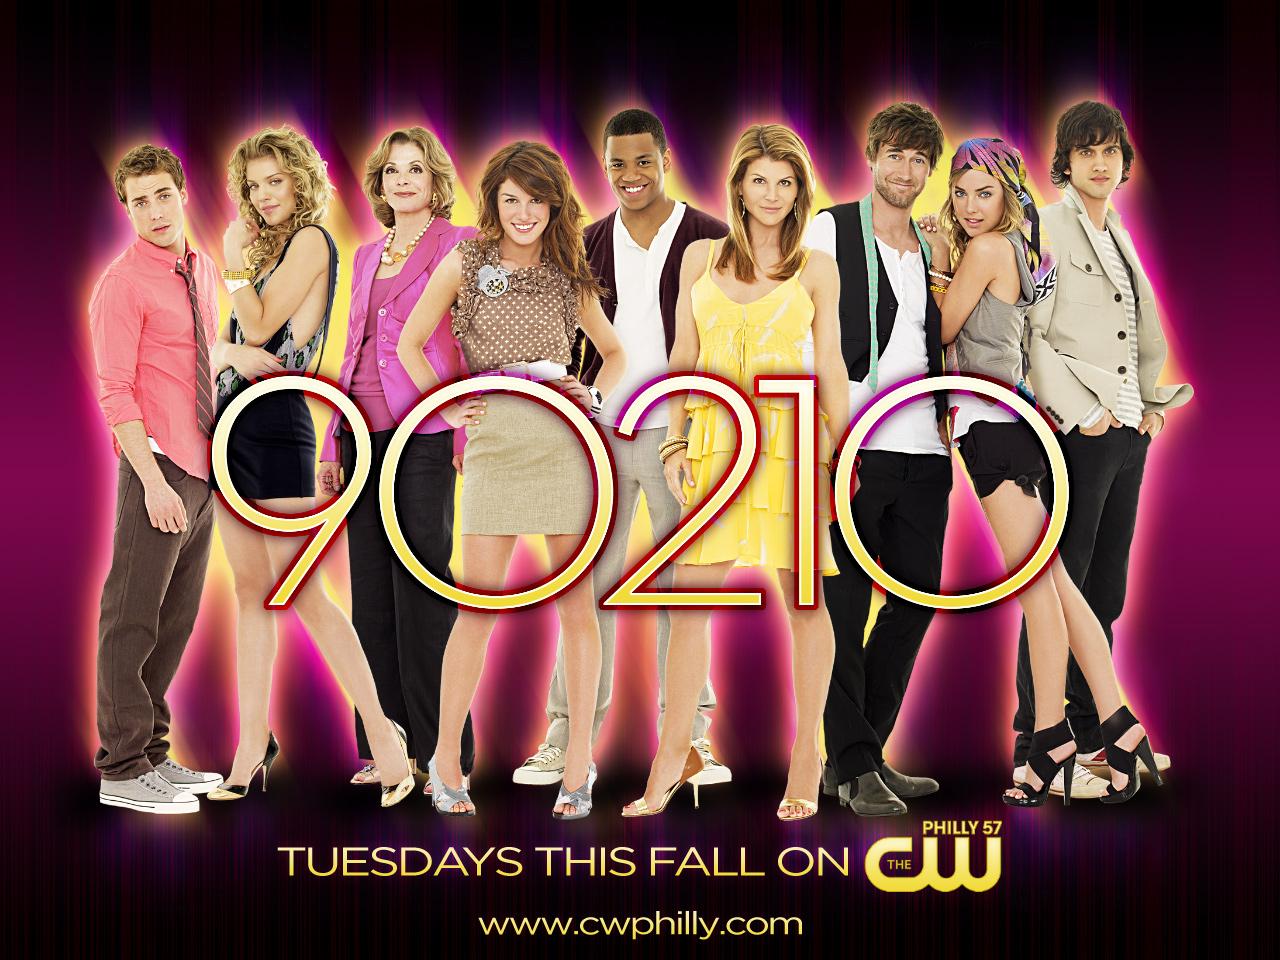 90210-logo1